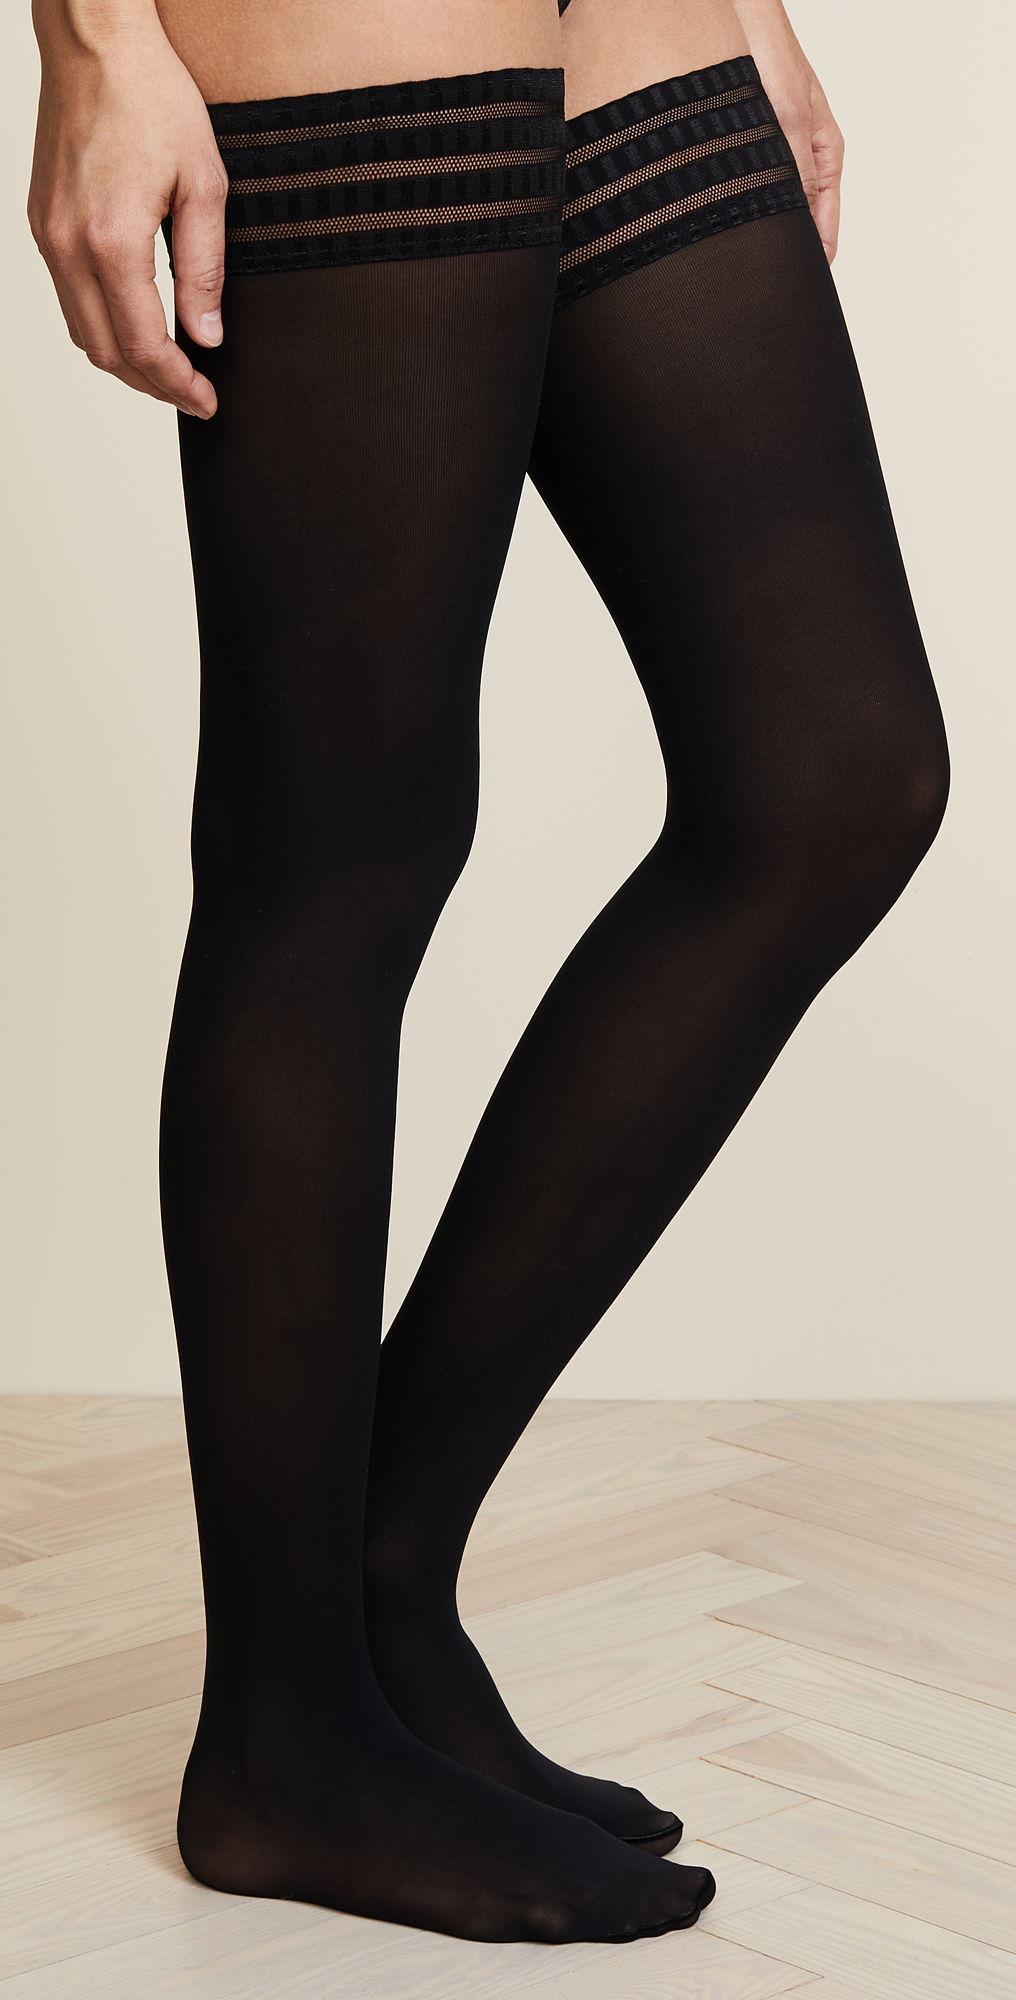 FALKE womens Pure Matte 50 Stayup Thigh High Stocking Tights